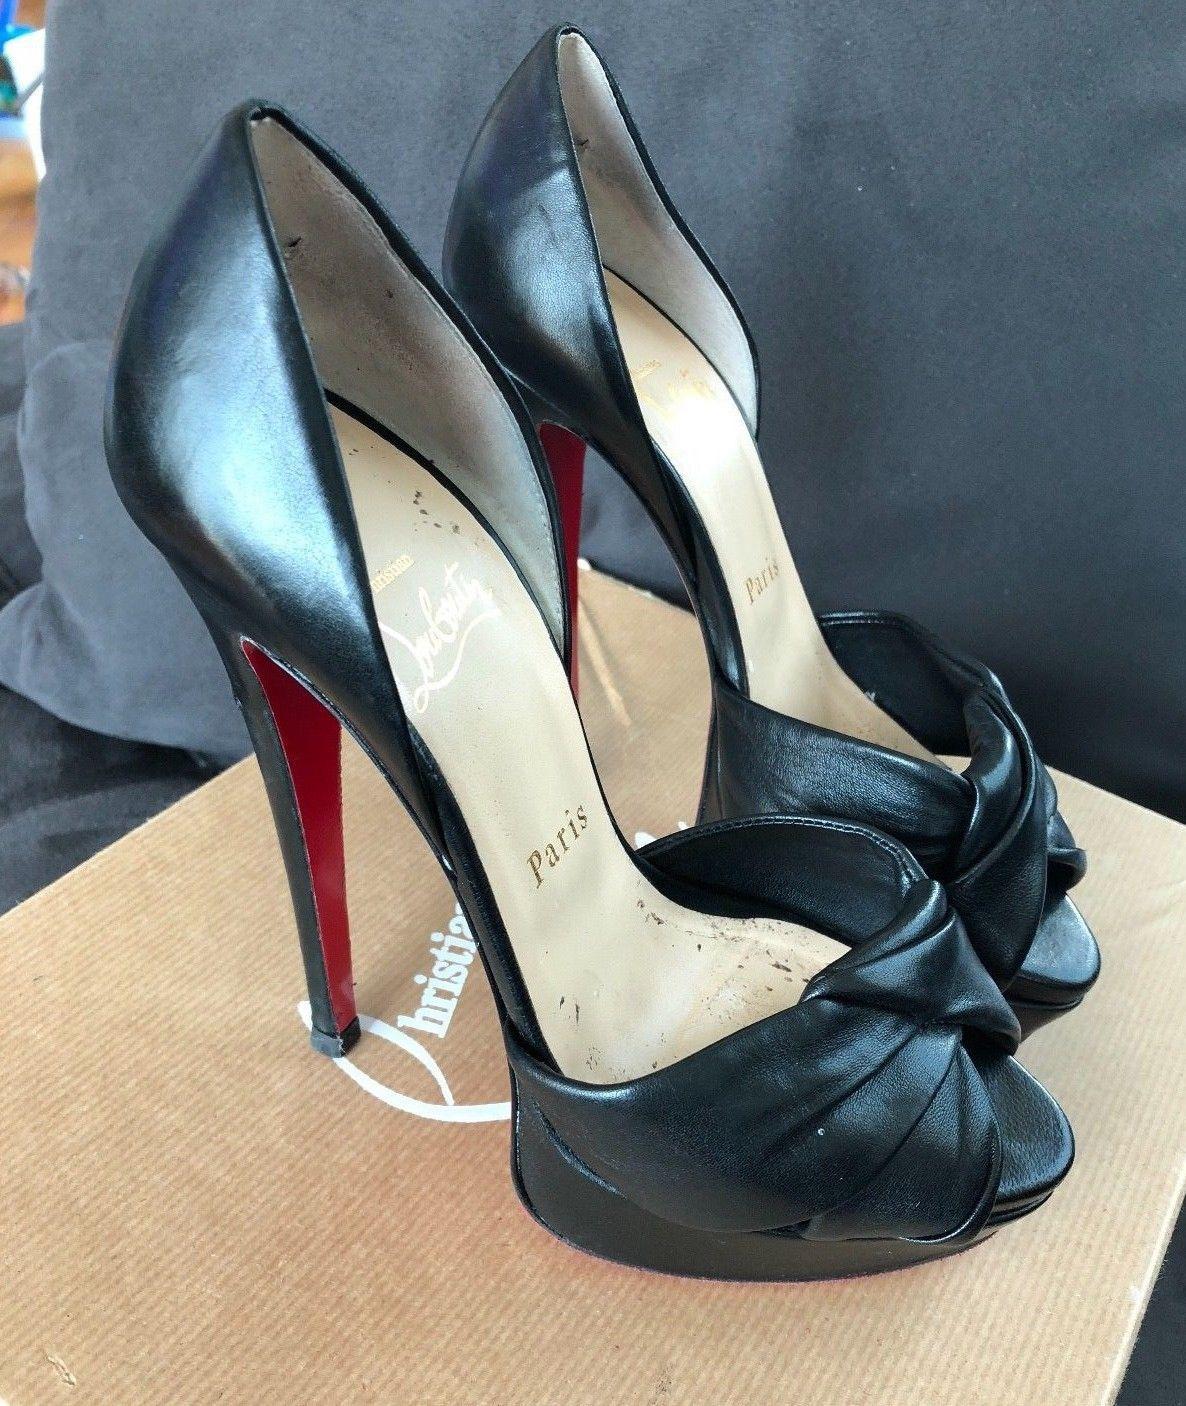 5cacb0ba226 Christian Louboutin Women shoes size 36 stiletto CL yeezy YSL heel red  bottom